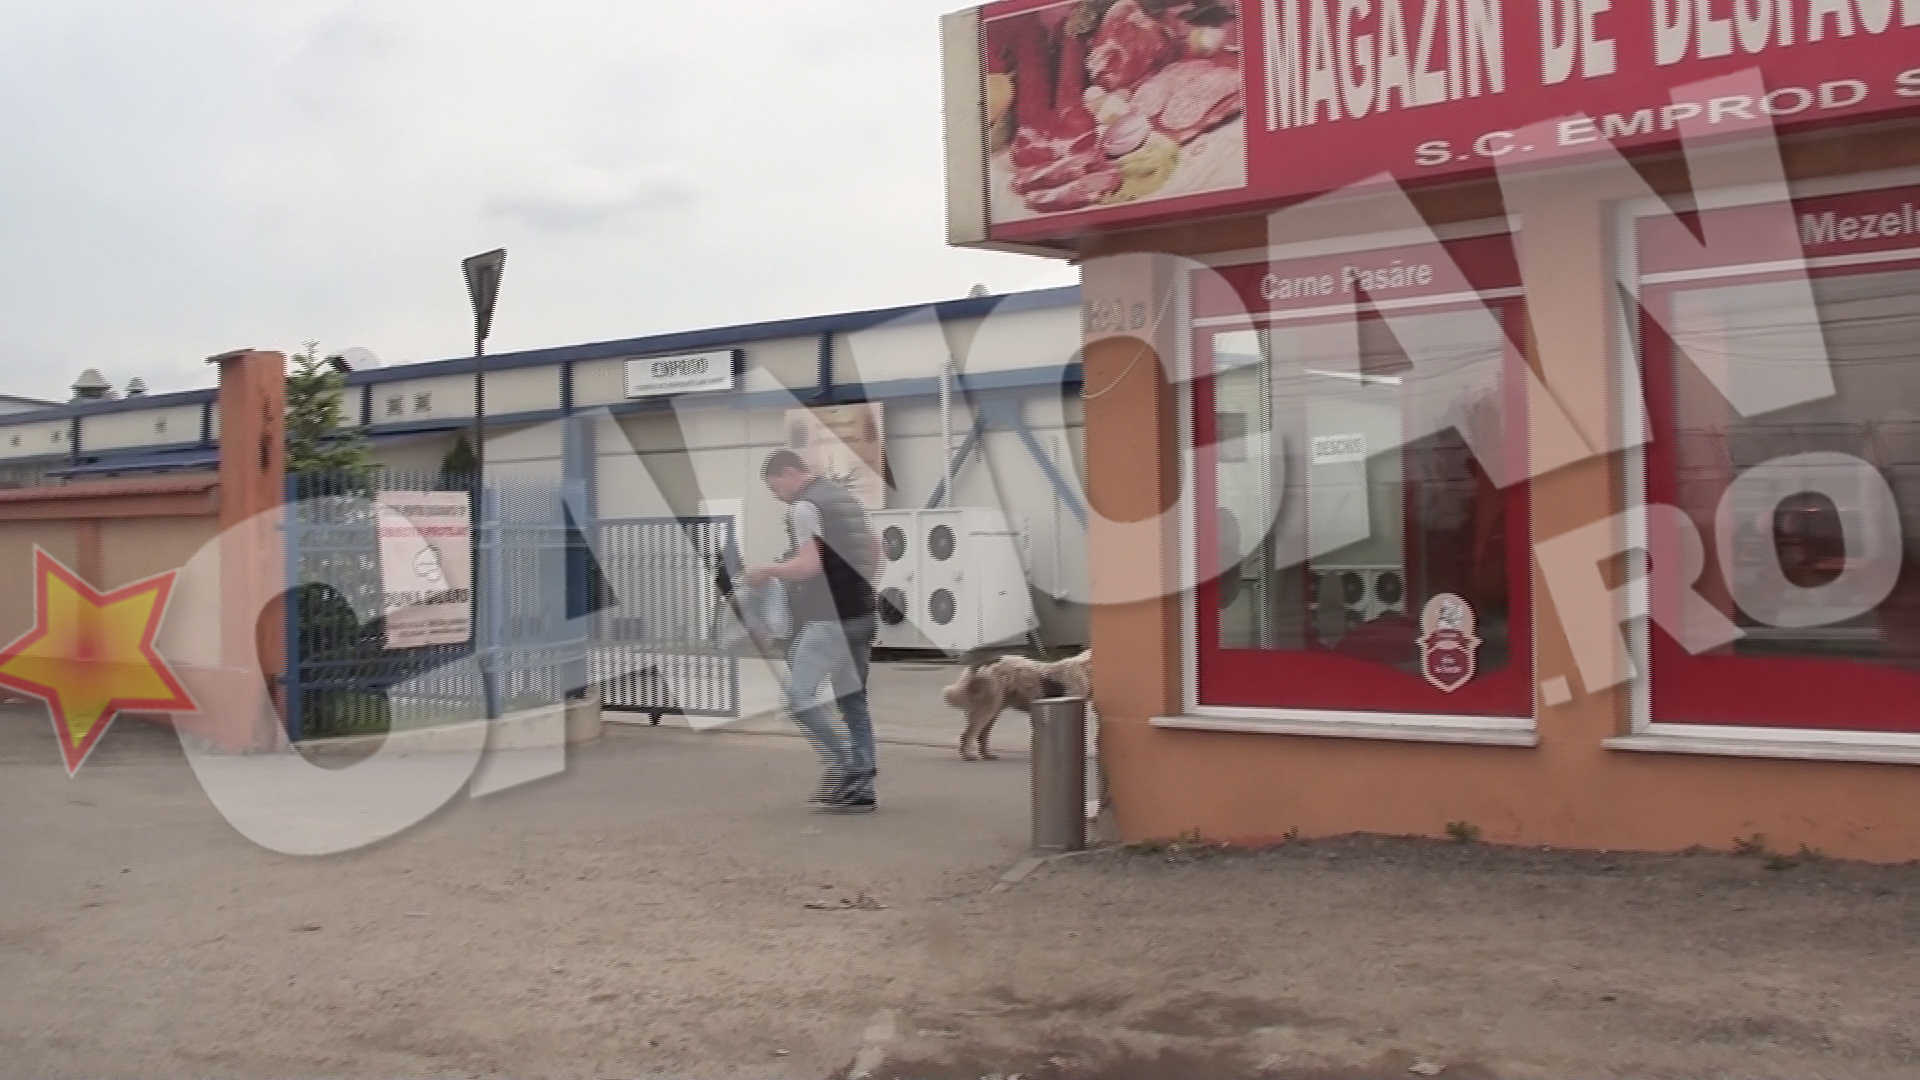 Actionarul echipei Steaua i-a dat cheile de la Maybach unui angajat si l-a trimis sa-i cumpere carne proaspata de la o macelarie